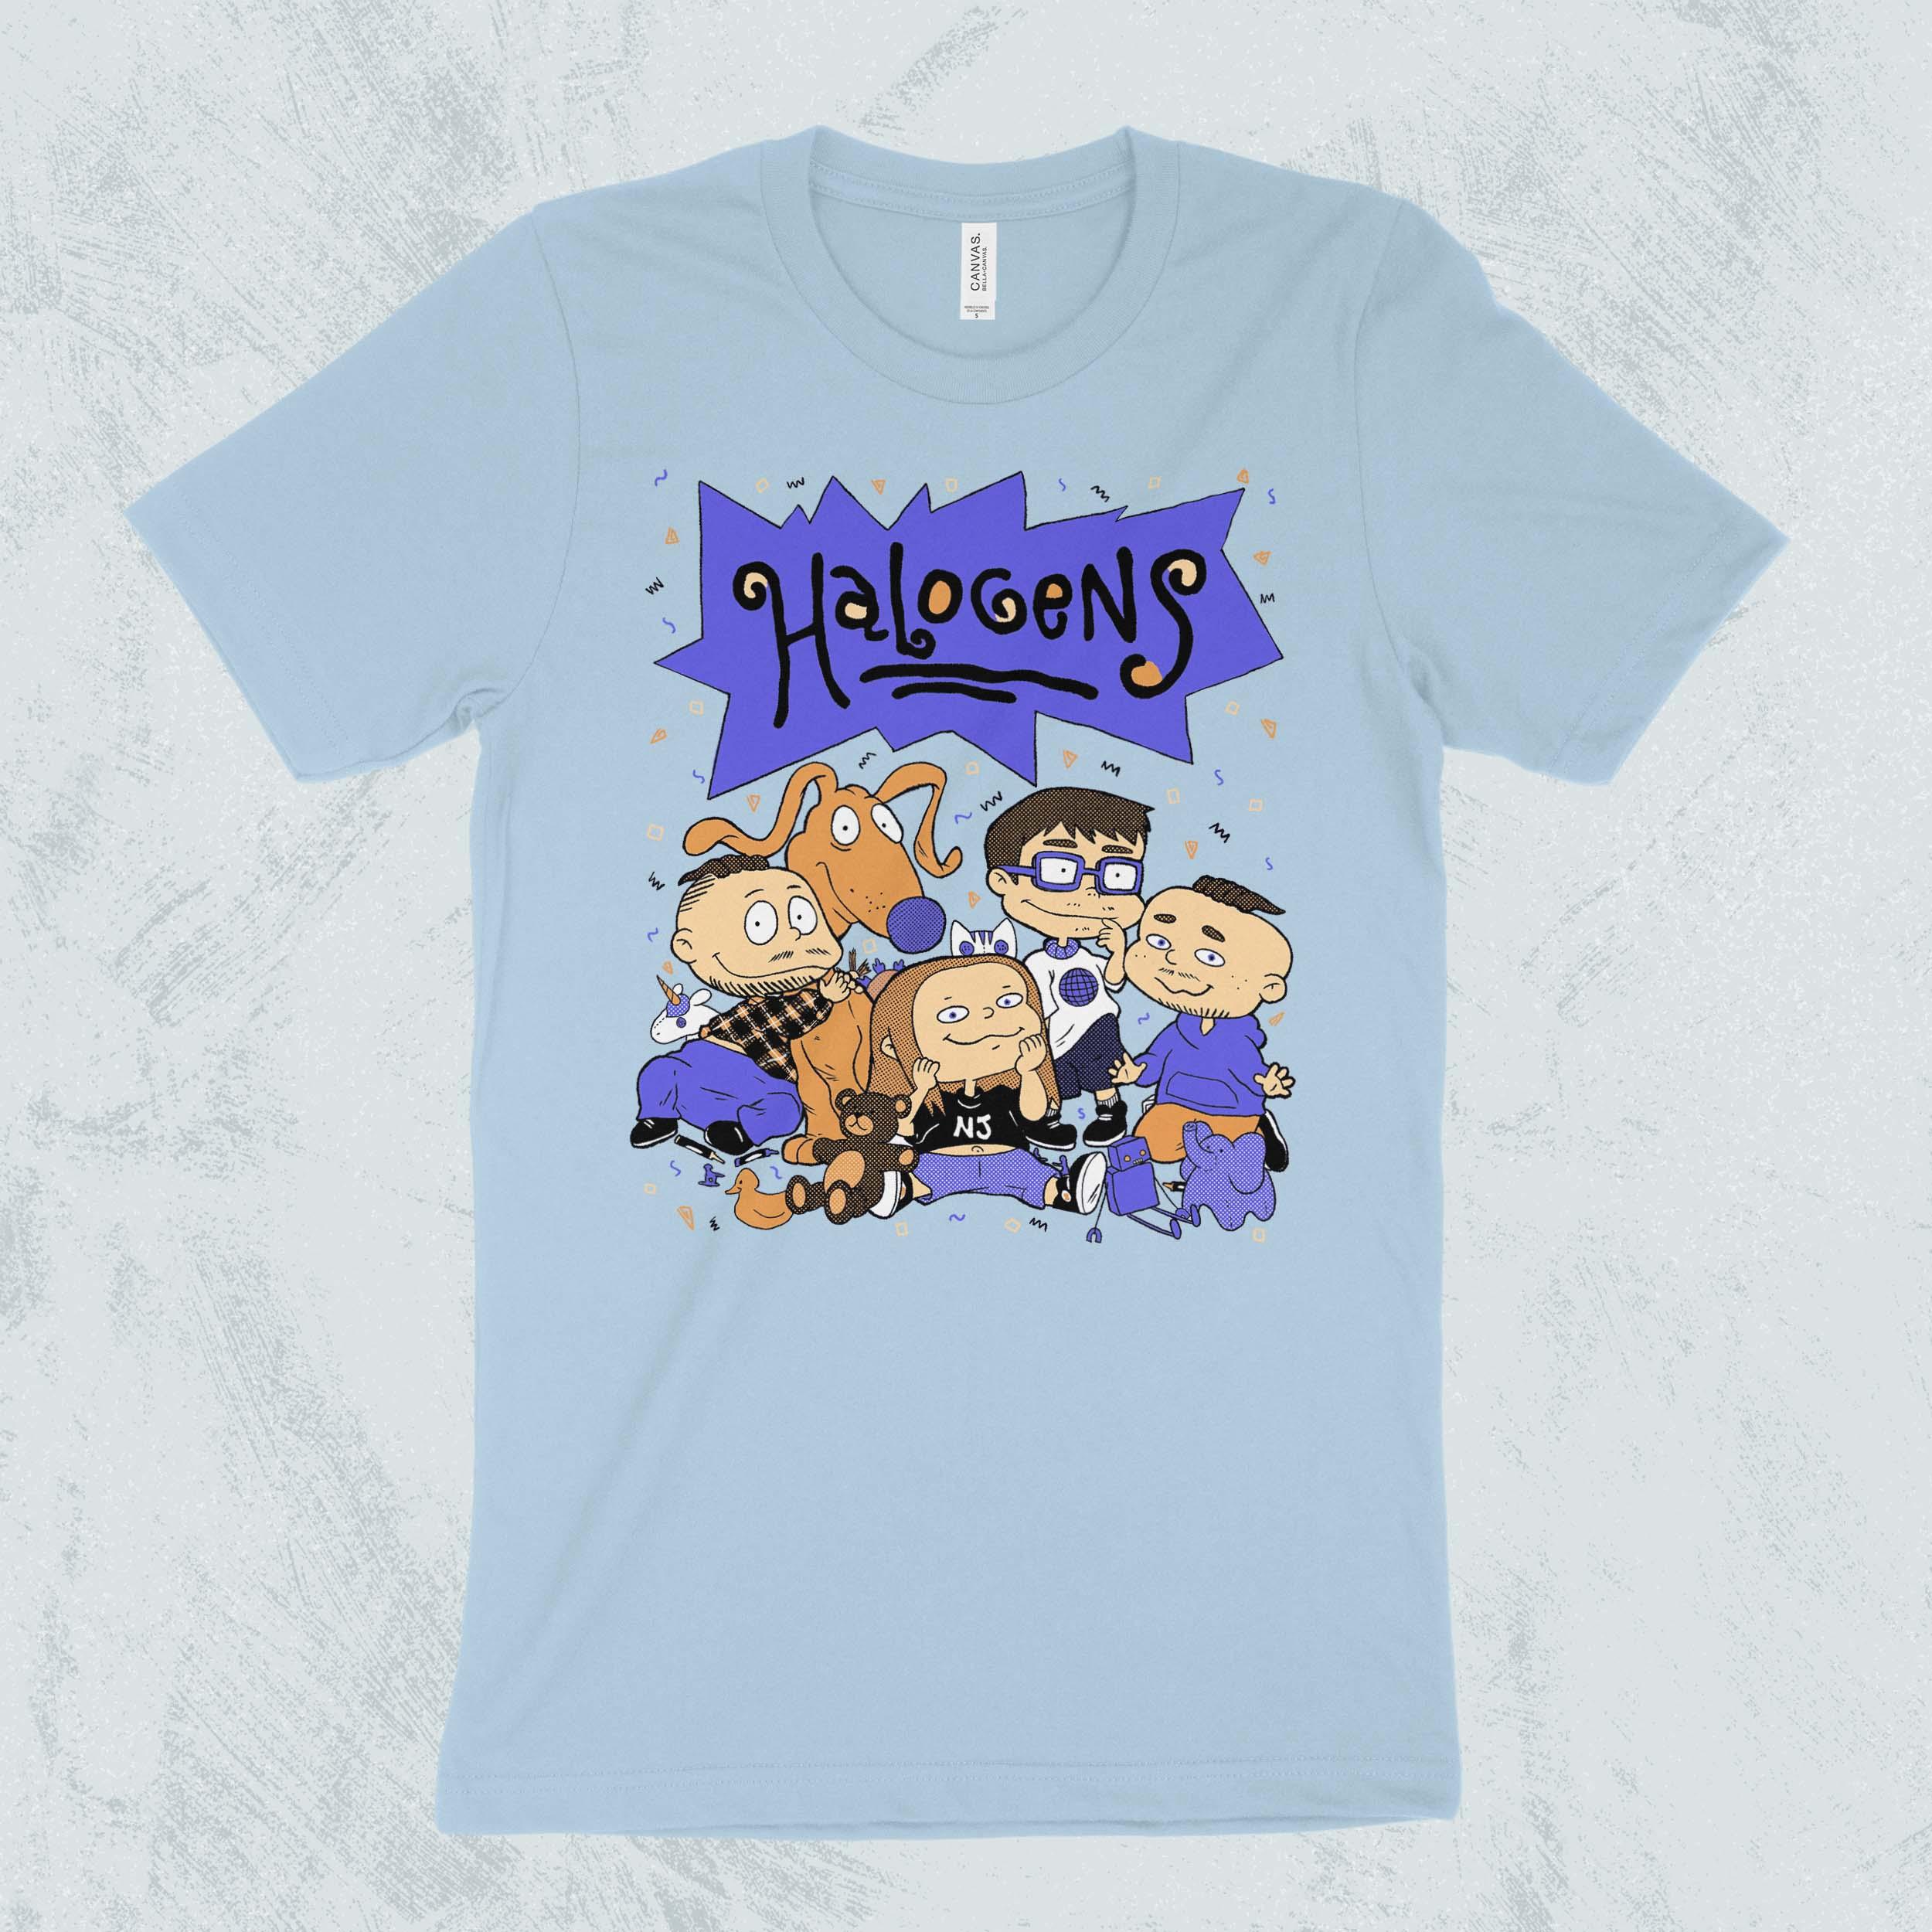 Halogens - Rugr*ts T-Shirt